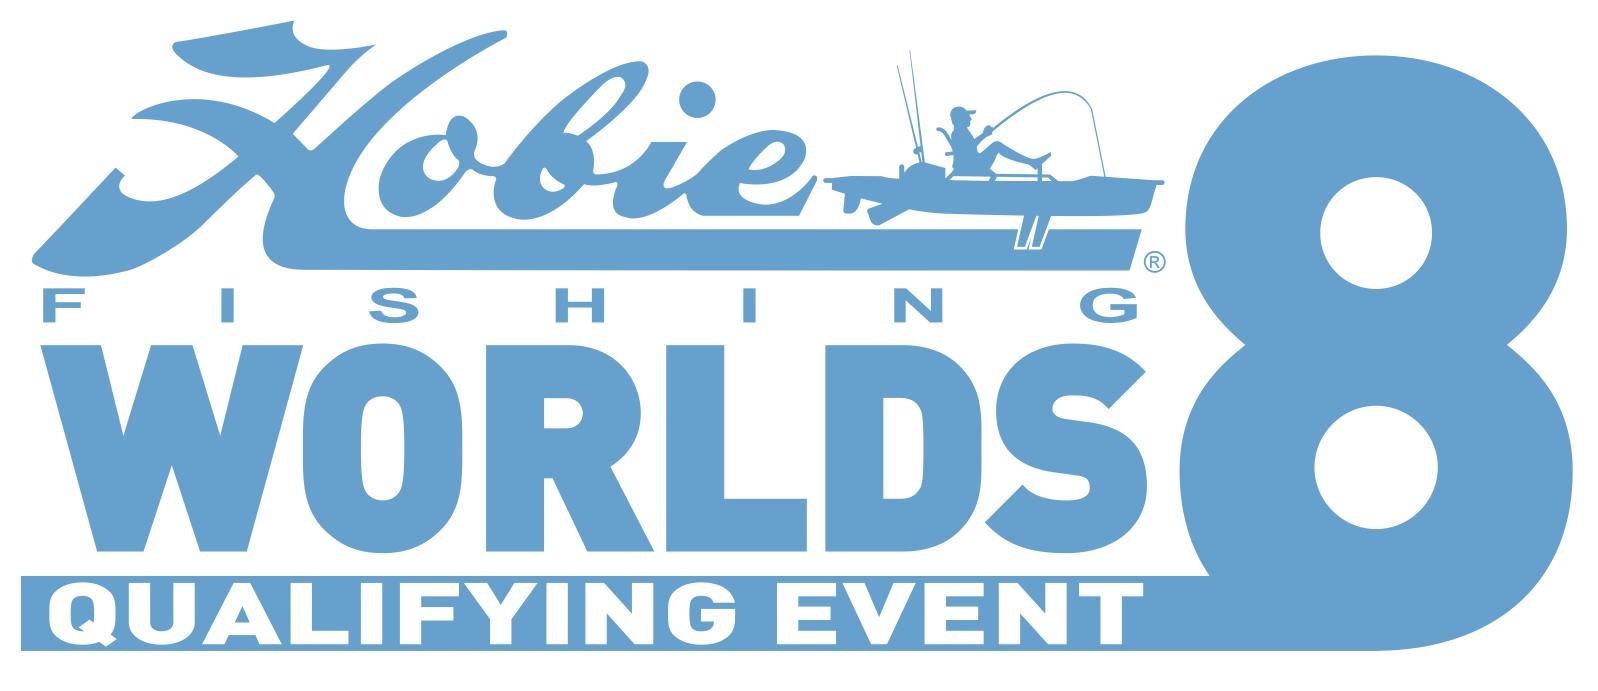 Hobie Worlds 8 Logo - Cyan